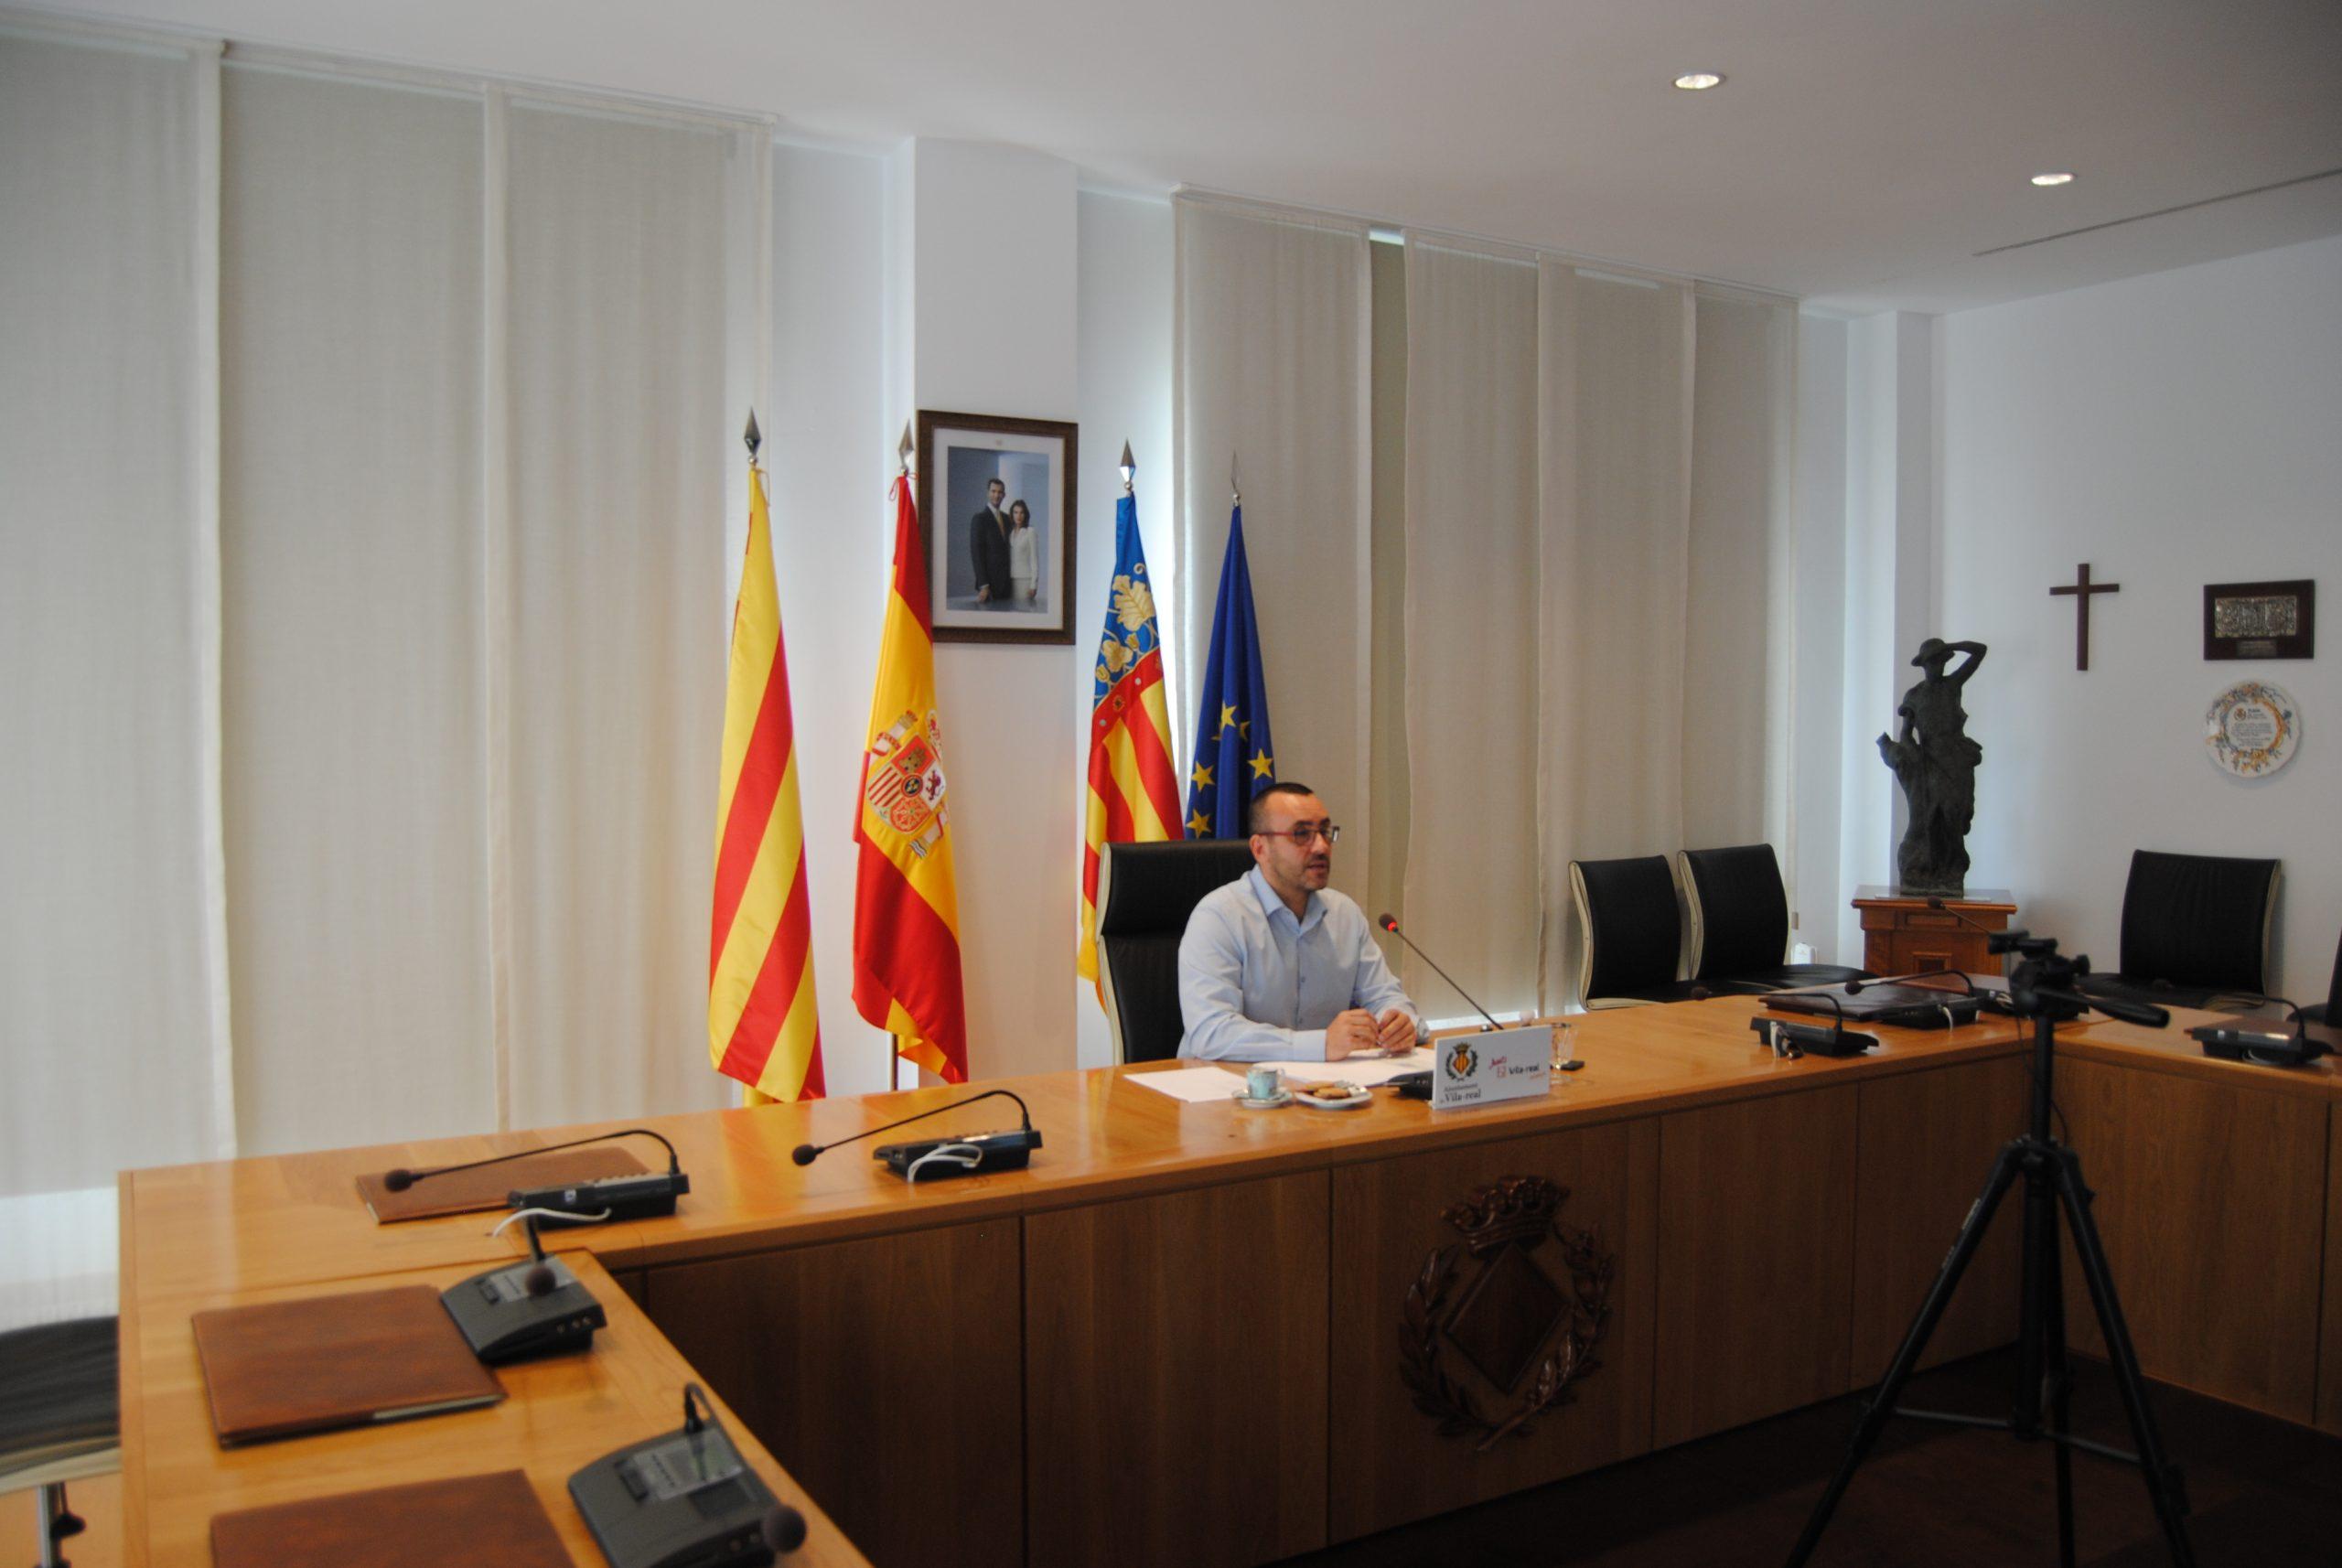 Rueda de prensa completa del alcalde de Vila-real, José Benlloch